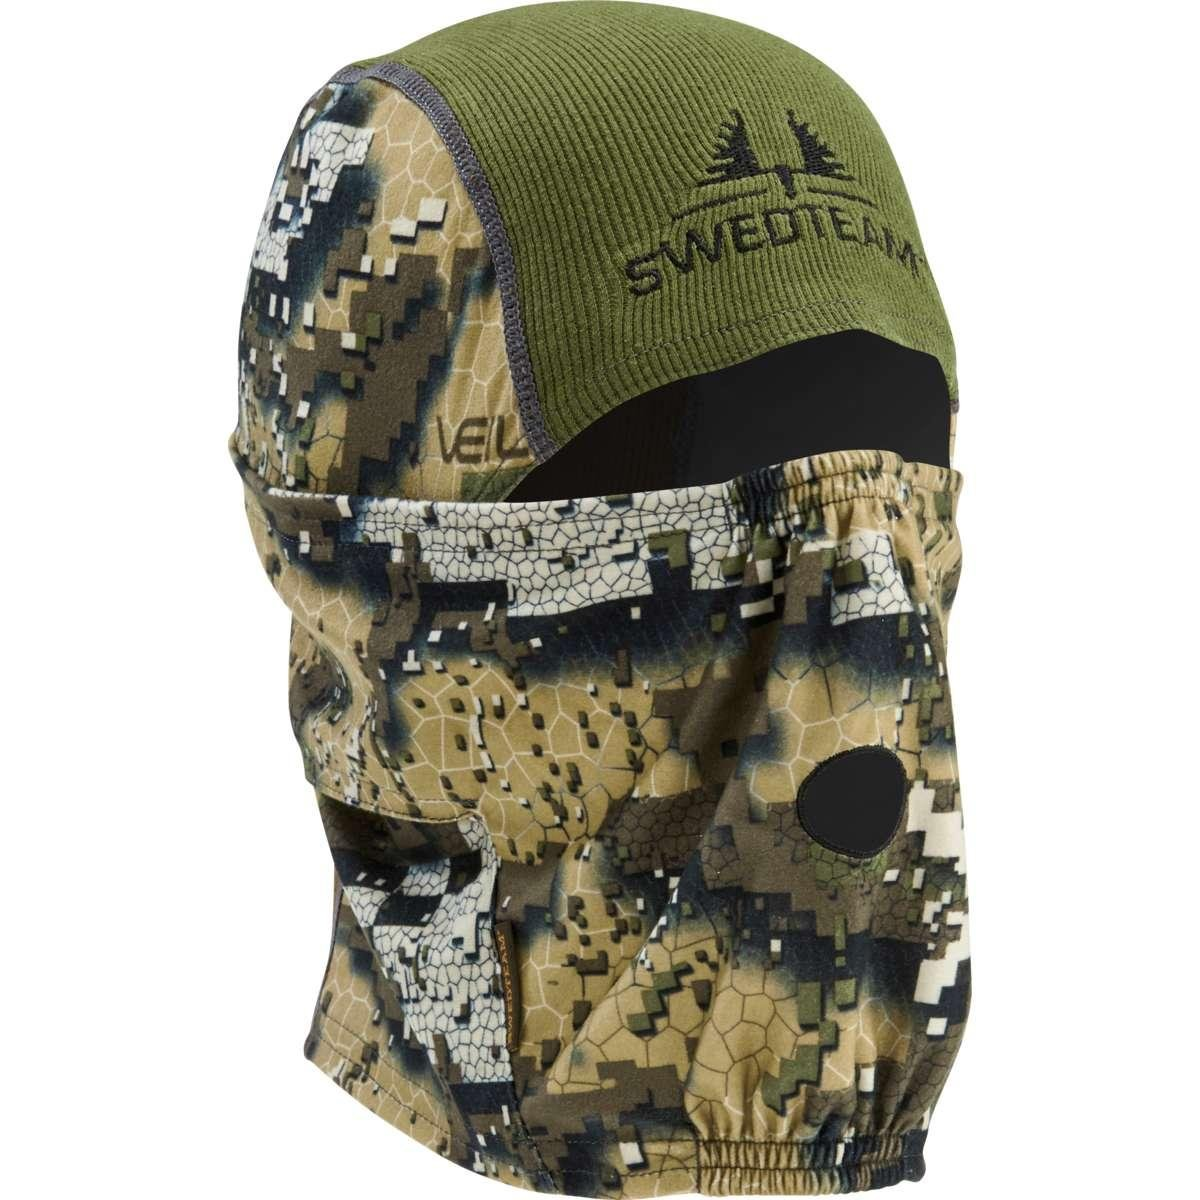 c1dc67eea71 Amazon.com   SwedTeam Ridge Camouflage Hood One Size Camo   Sports    Outdoors